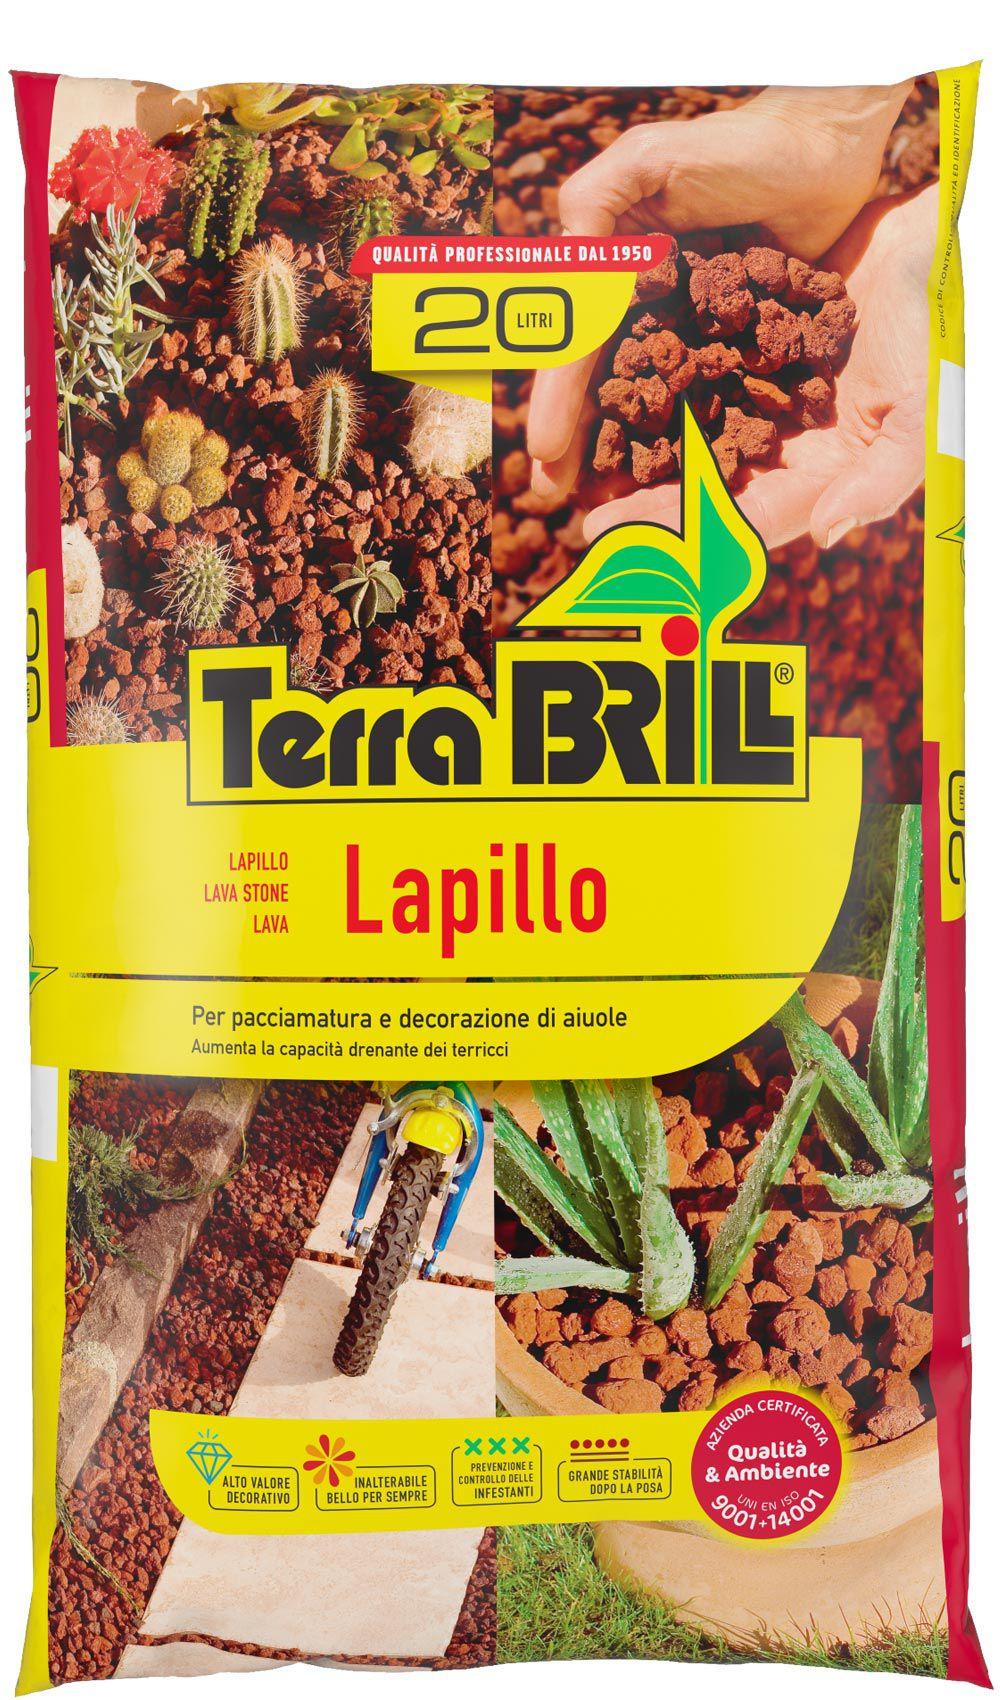 TerraBrill® Lapillo